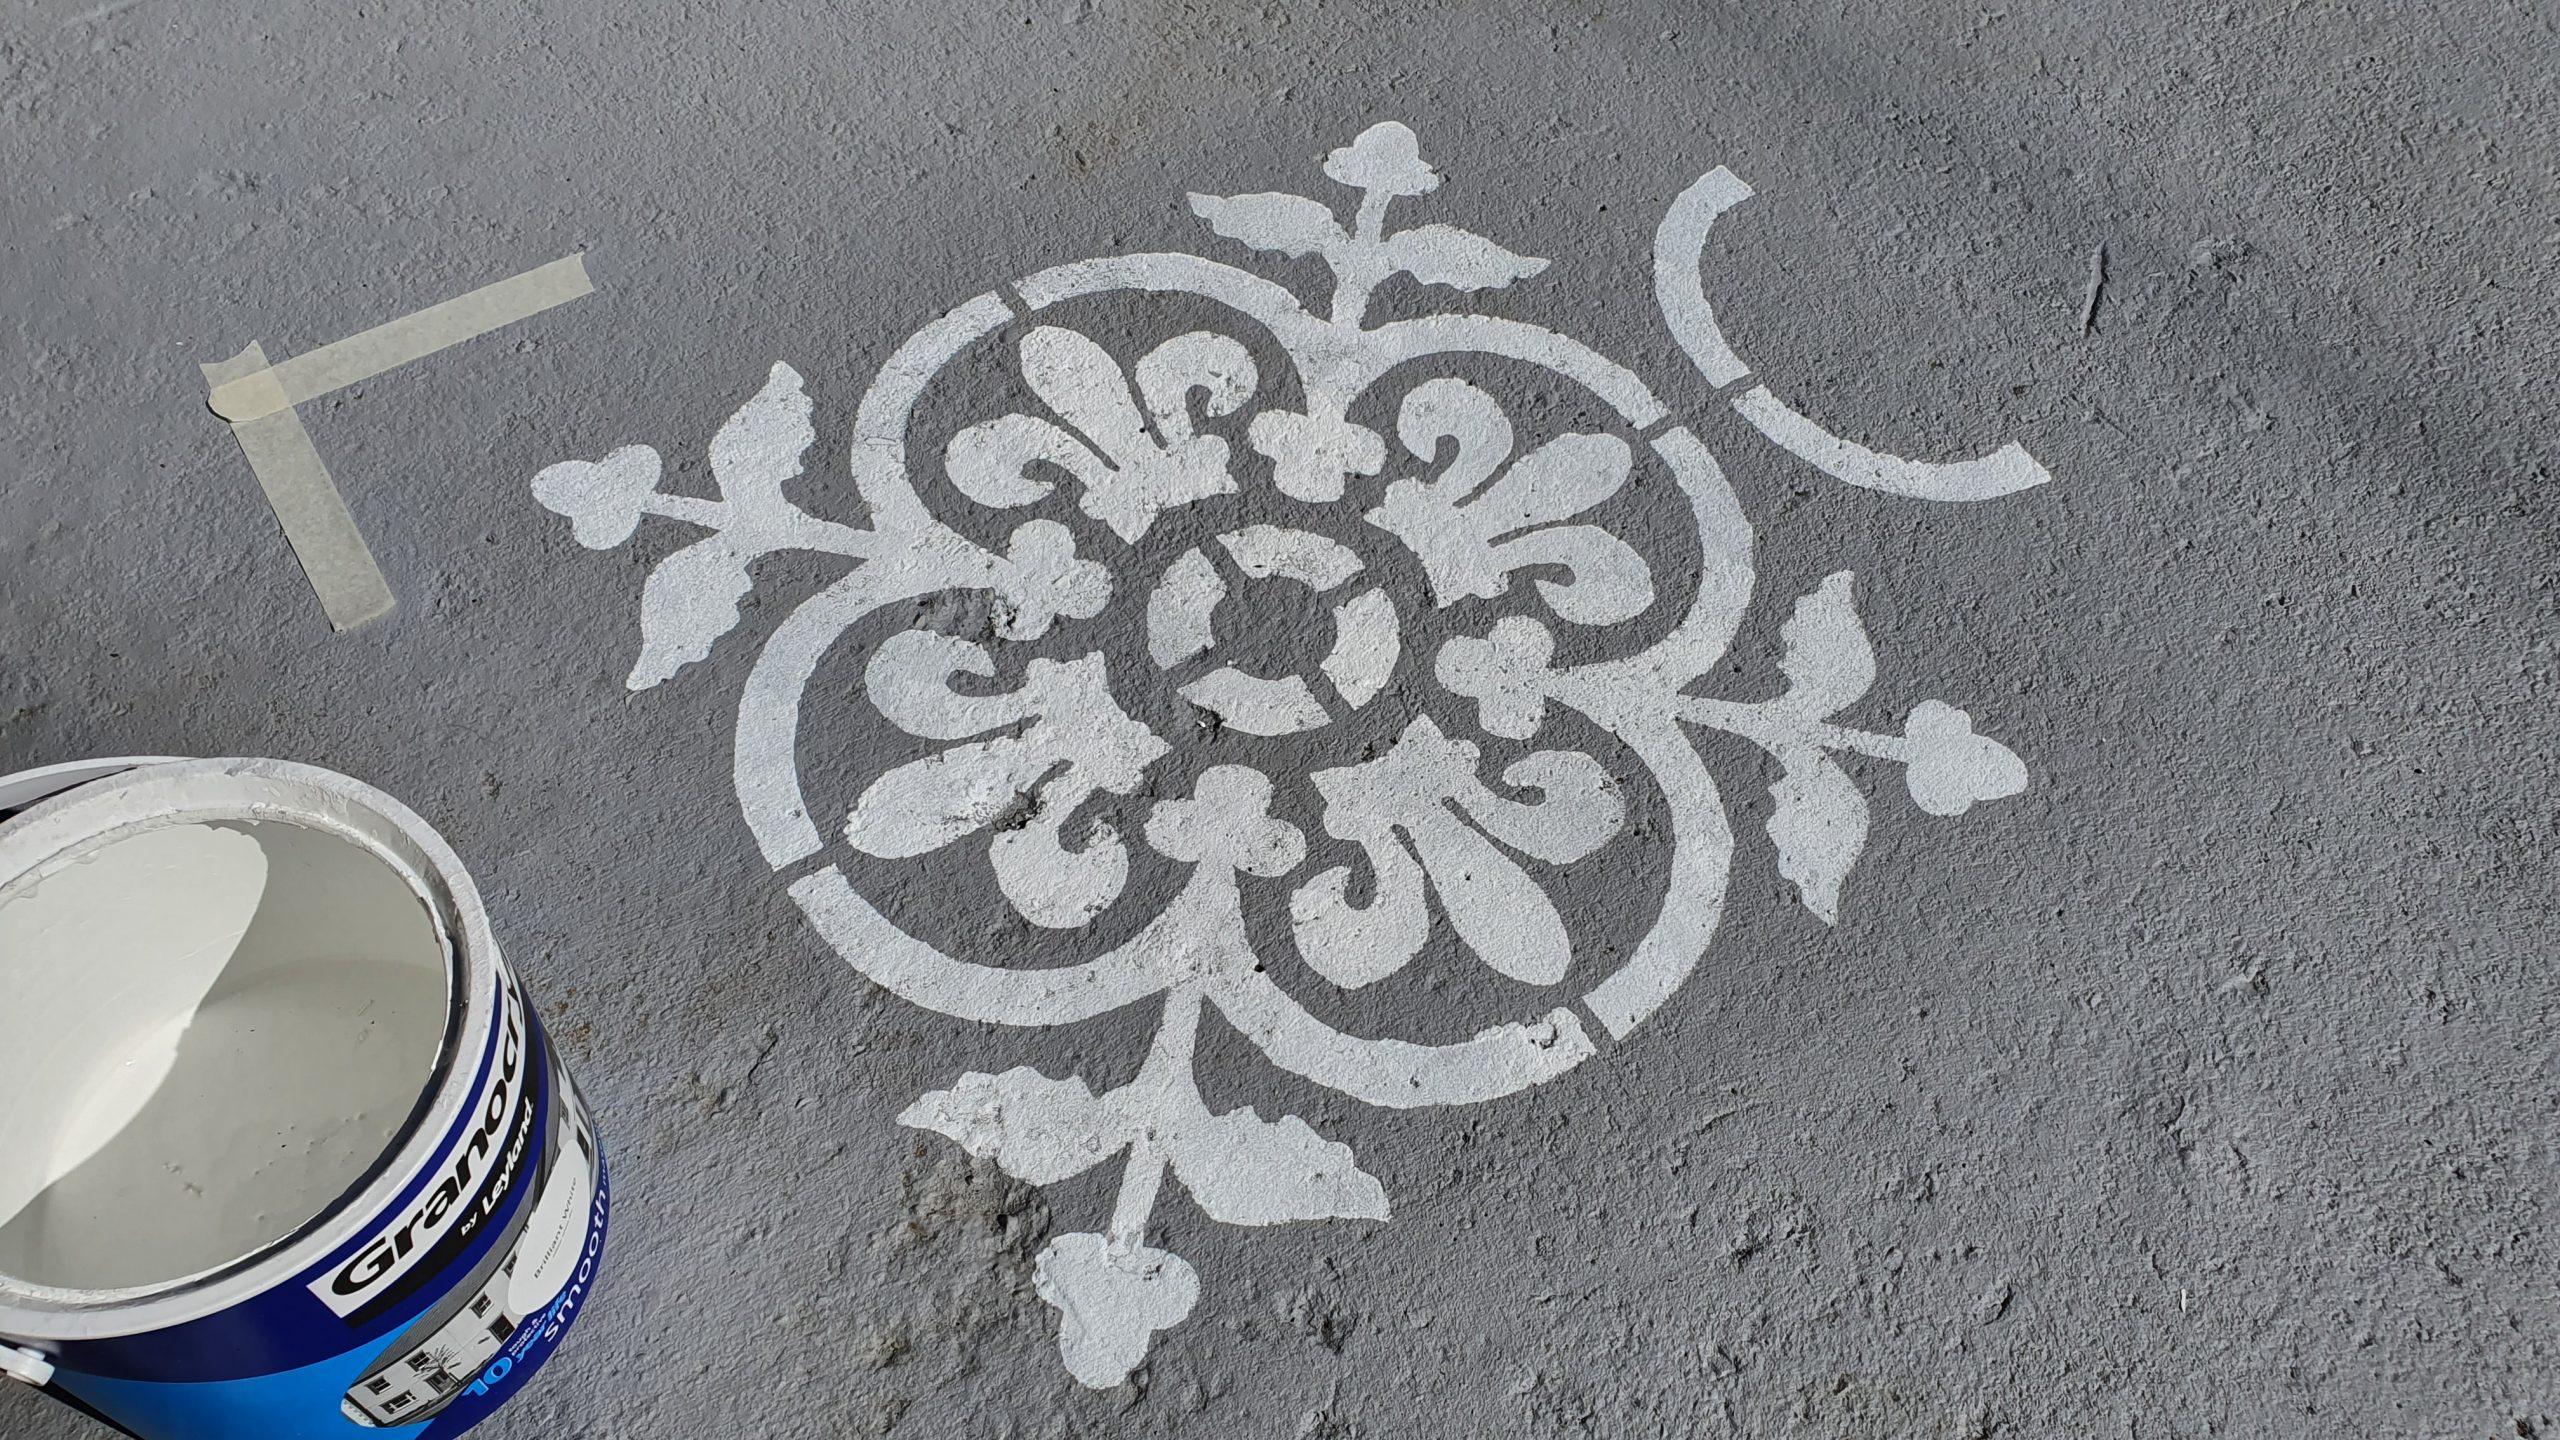 dizzy duck stencil patio